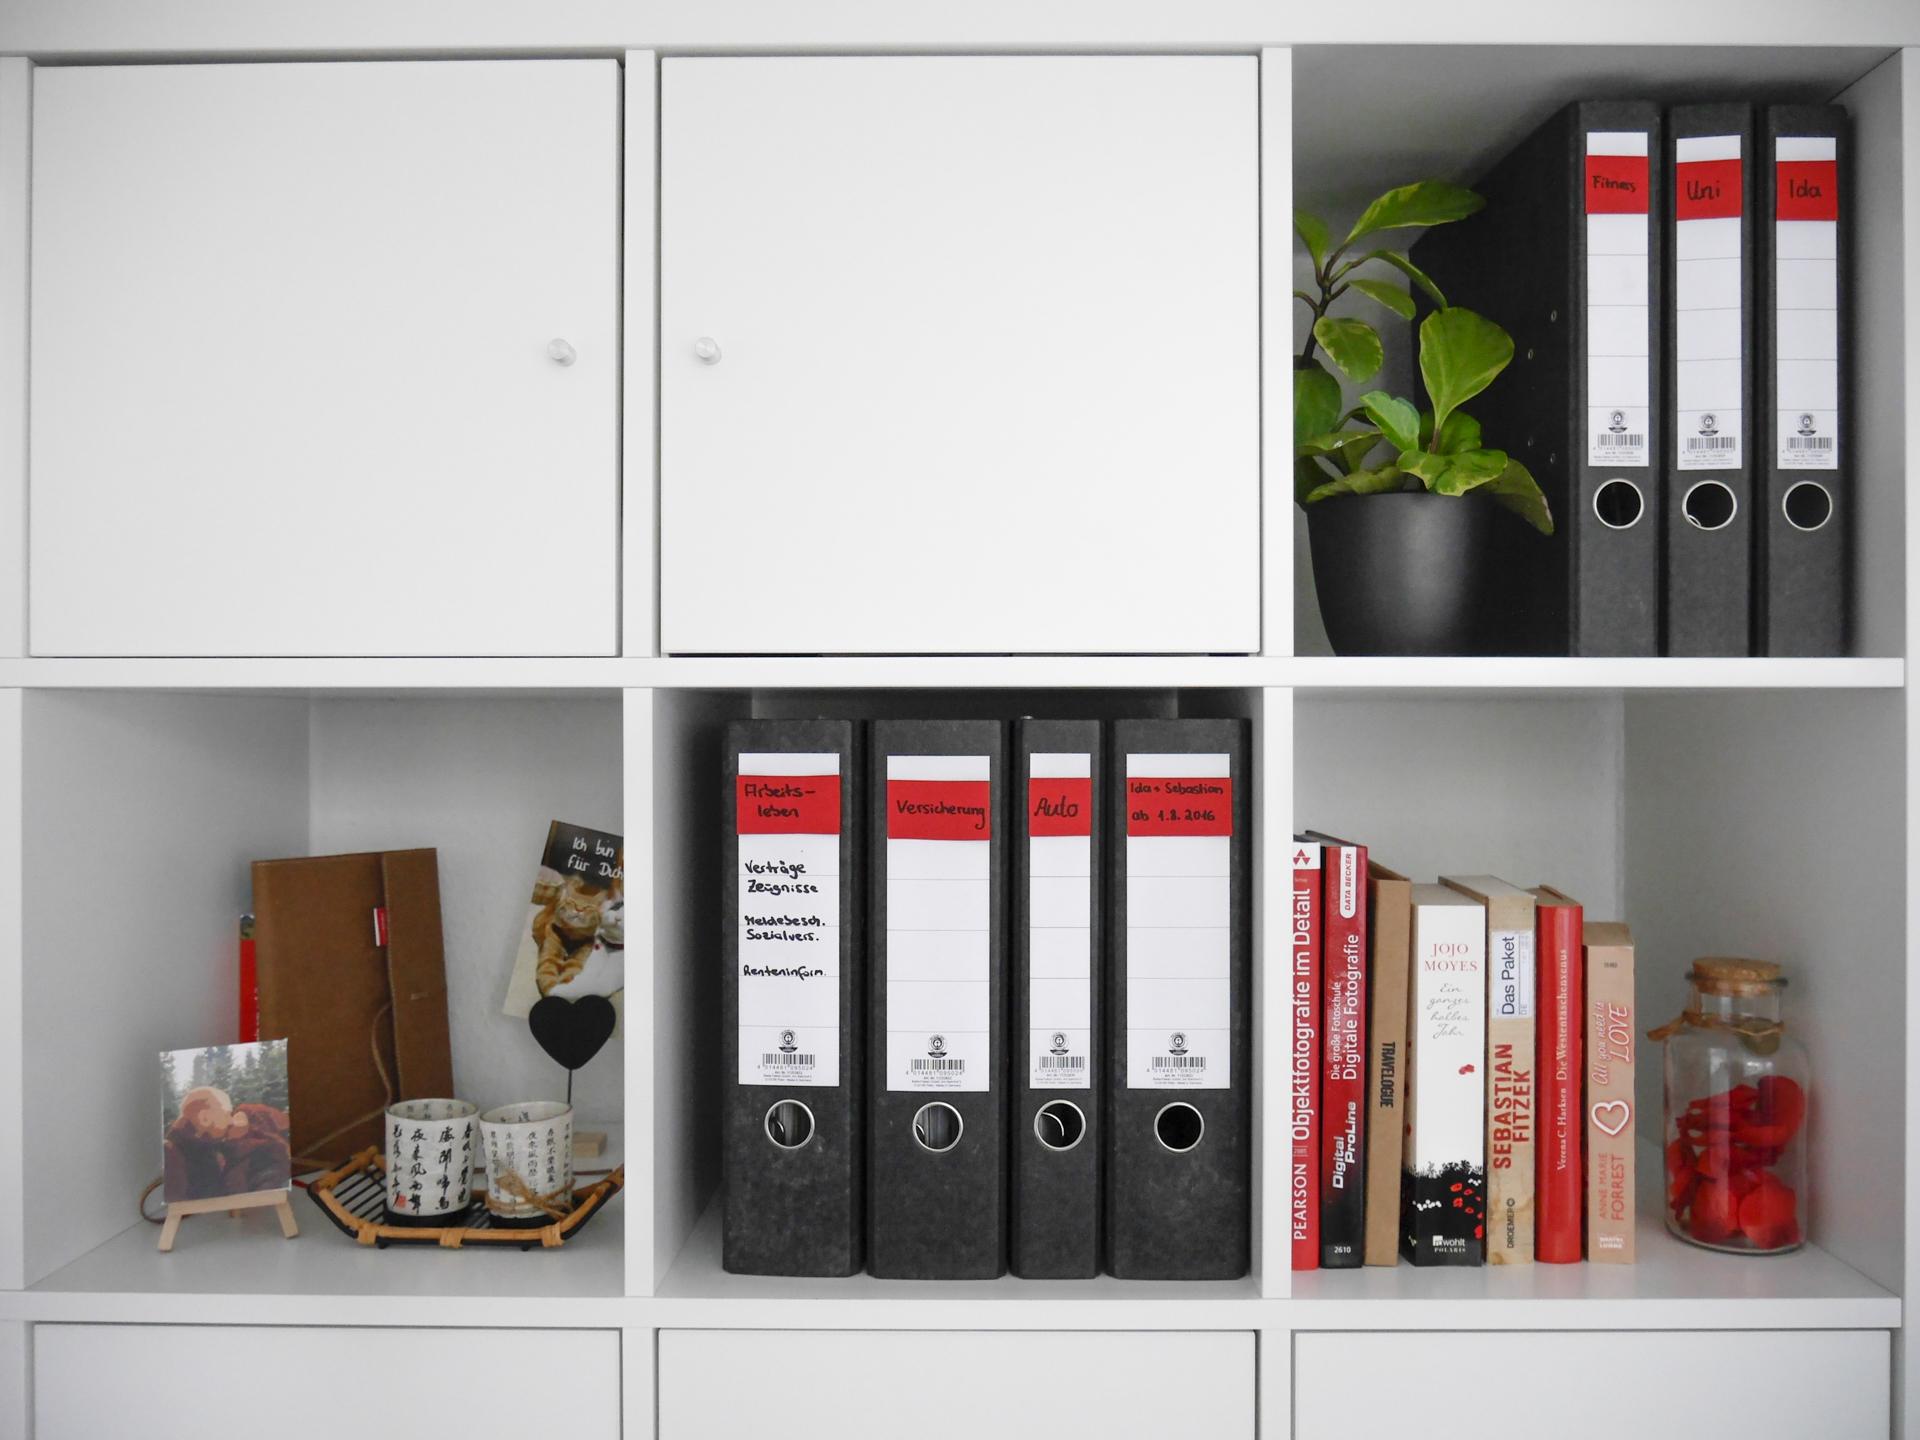 beautiful ikea regale kallax einrichtungsideen images. Black Bedroom Furniture Sets. Home Design Ideas